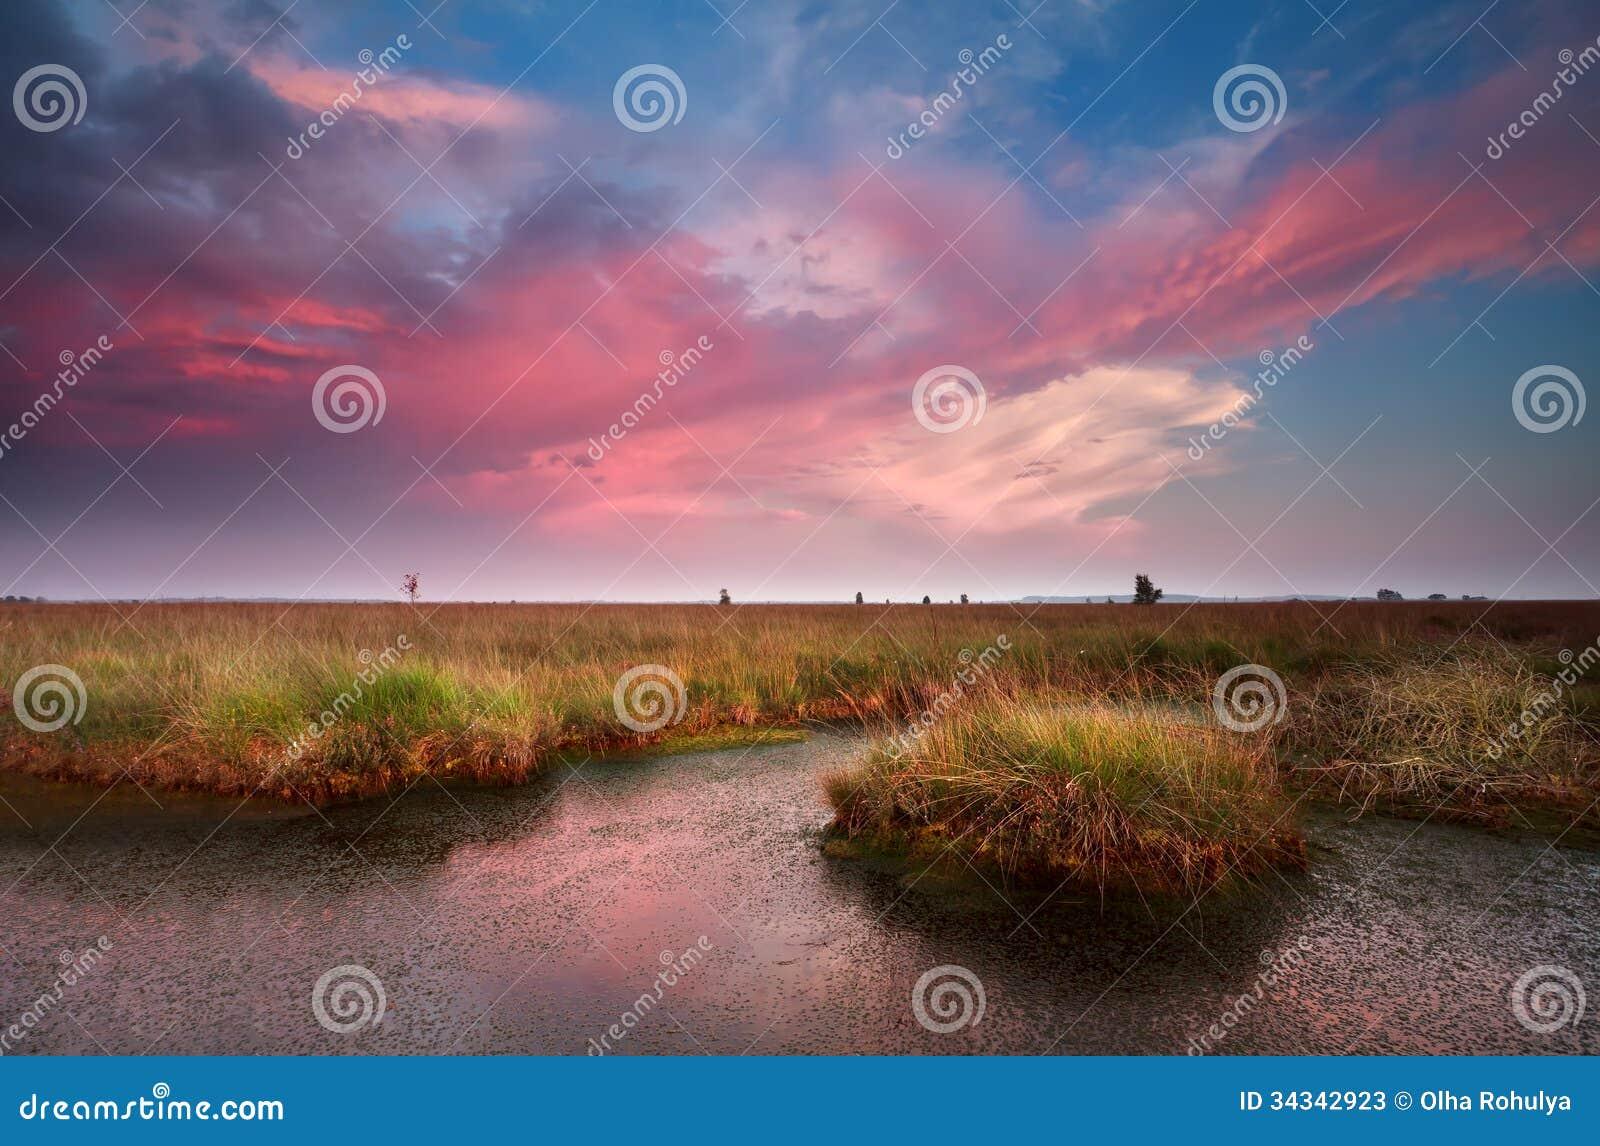 Citaten Over Zonsondergang : Dramatische roze zonsondergang over moeras stock